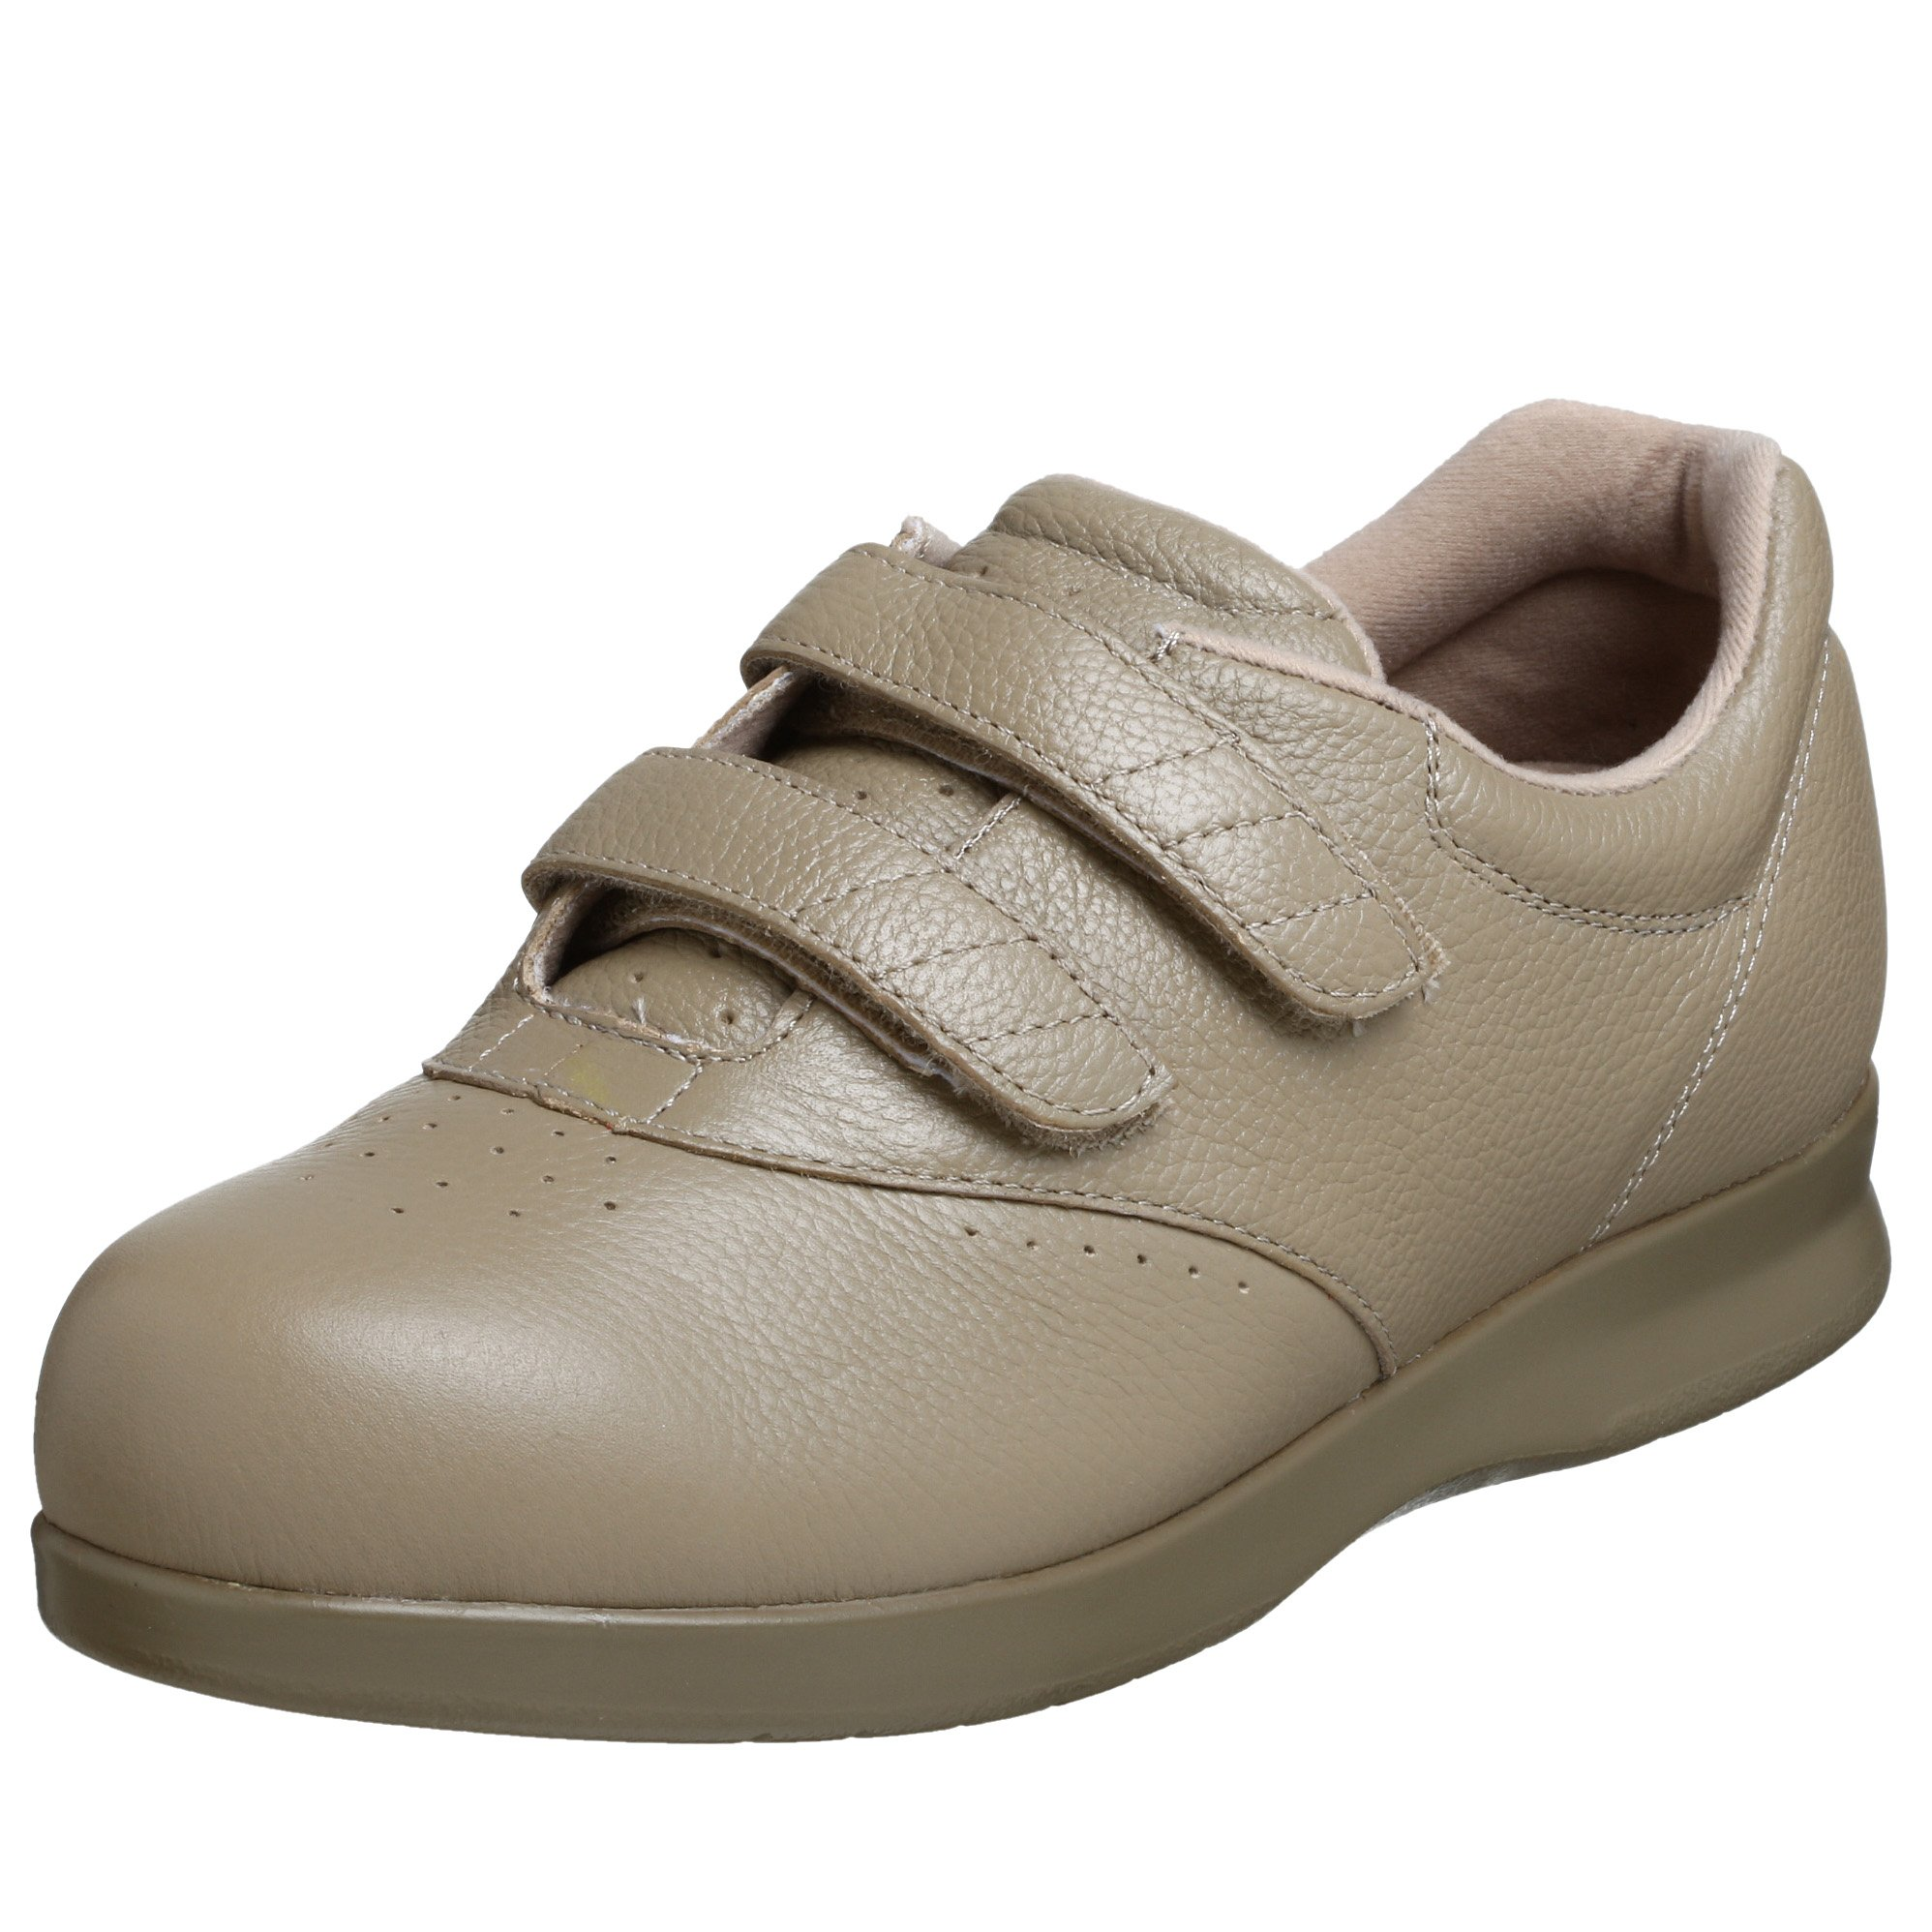 Drew Shoe Women's Paradise II Velco Slip-on,Taupe Calf,10 M US